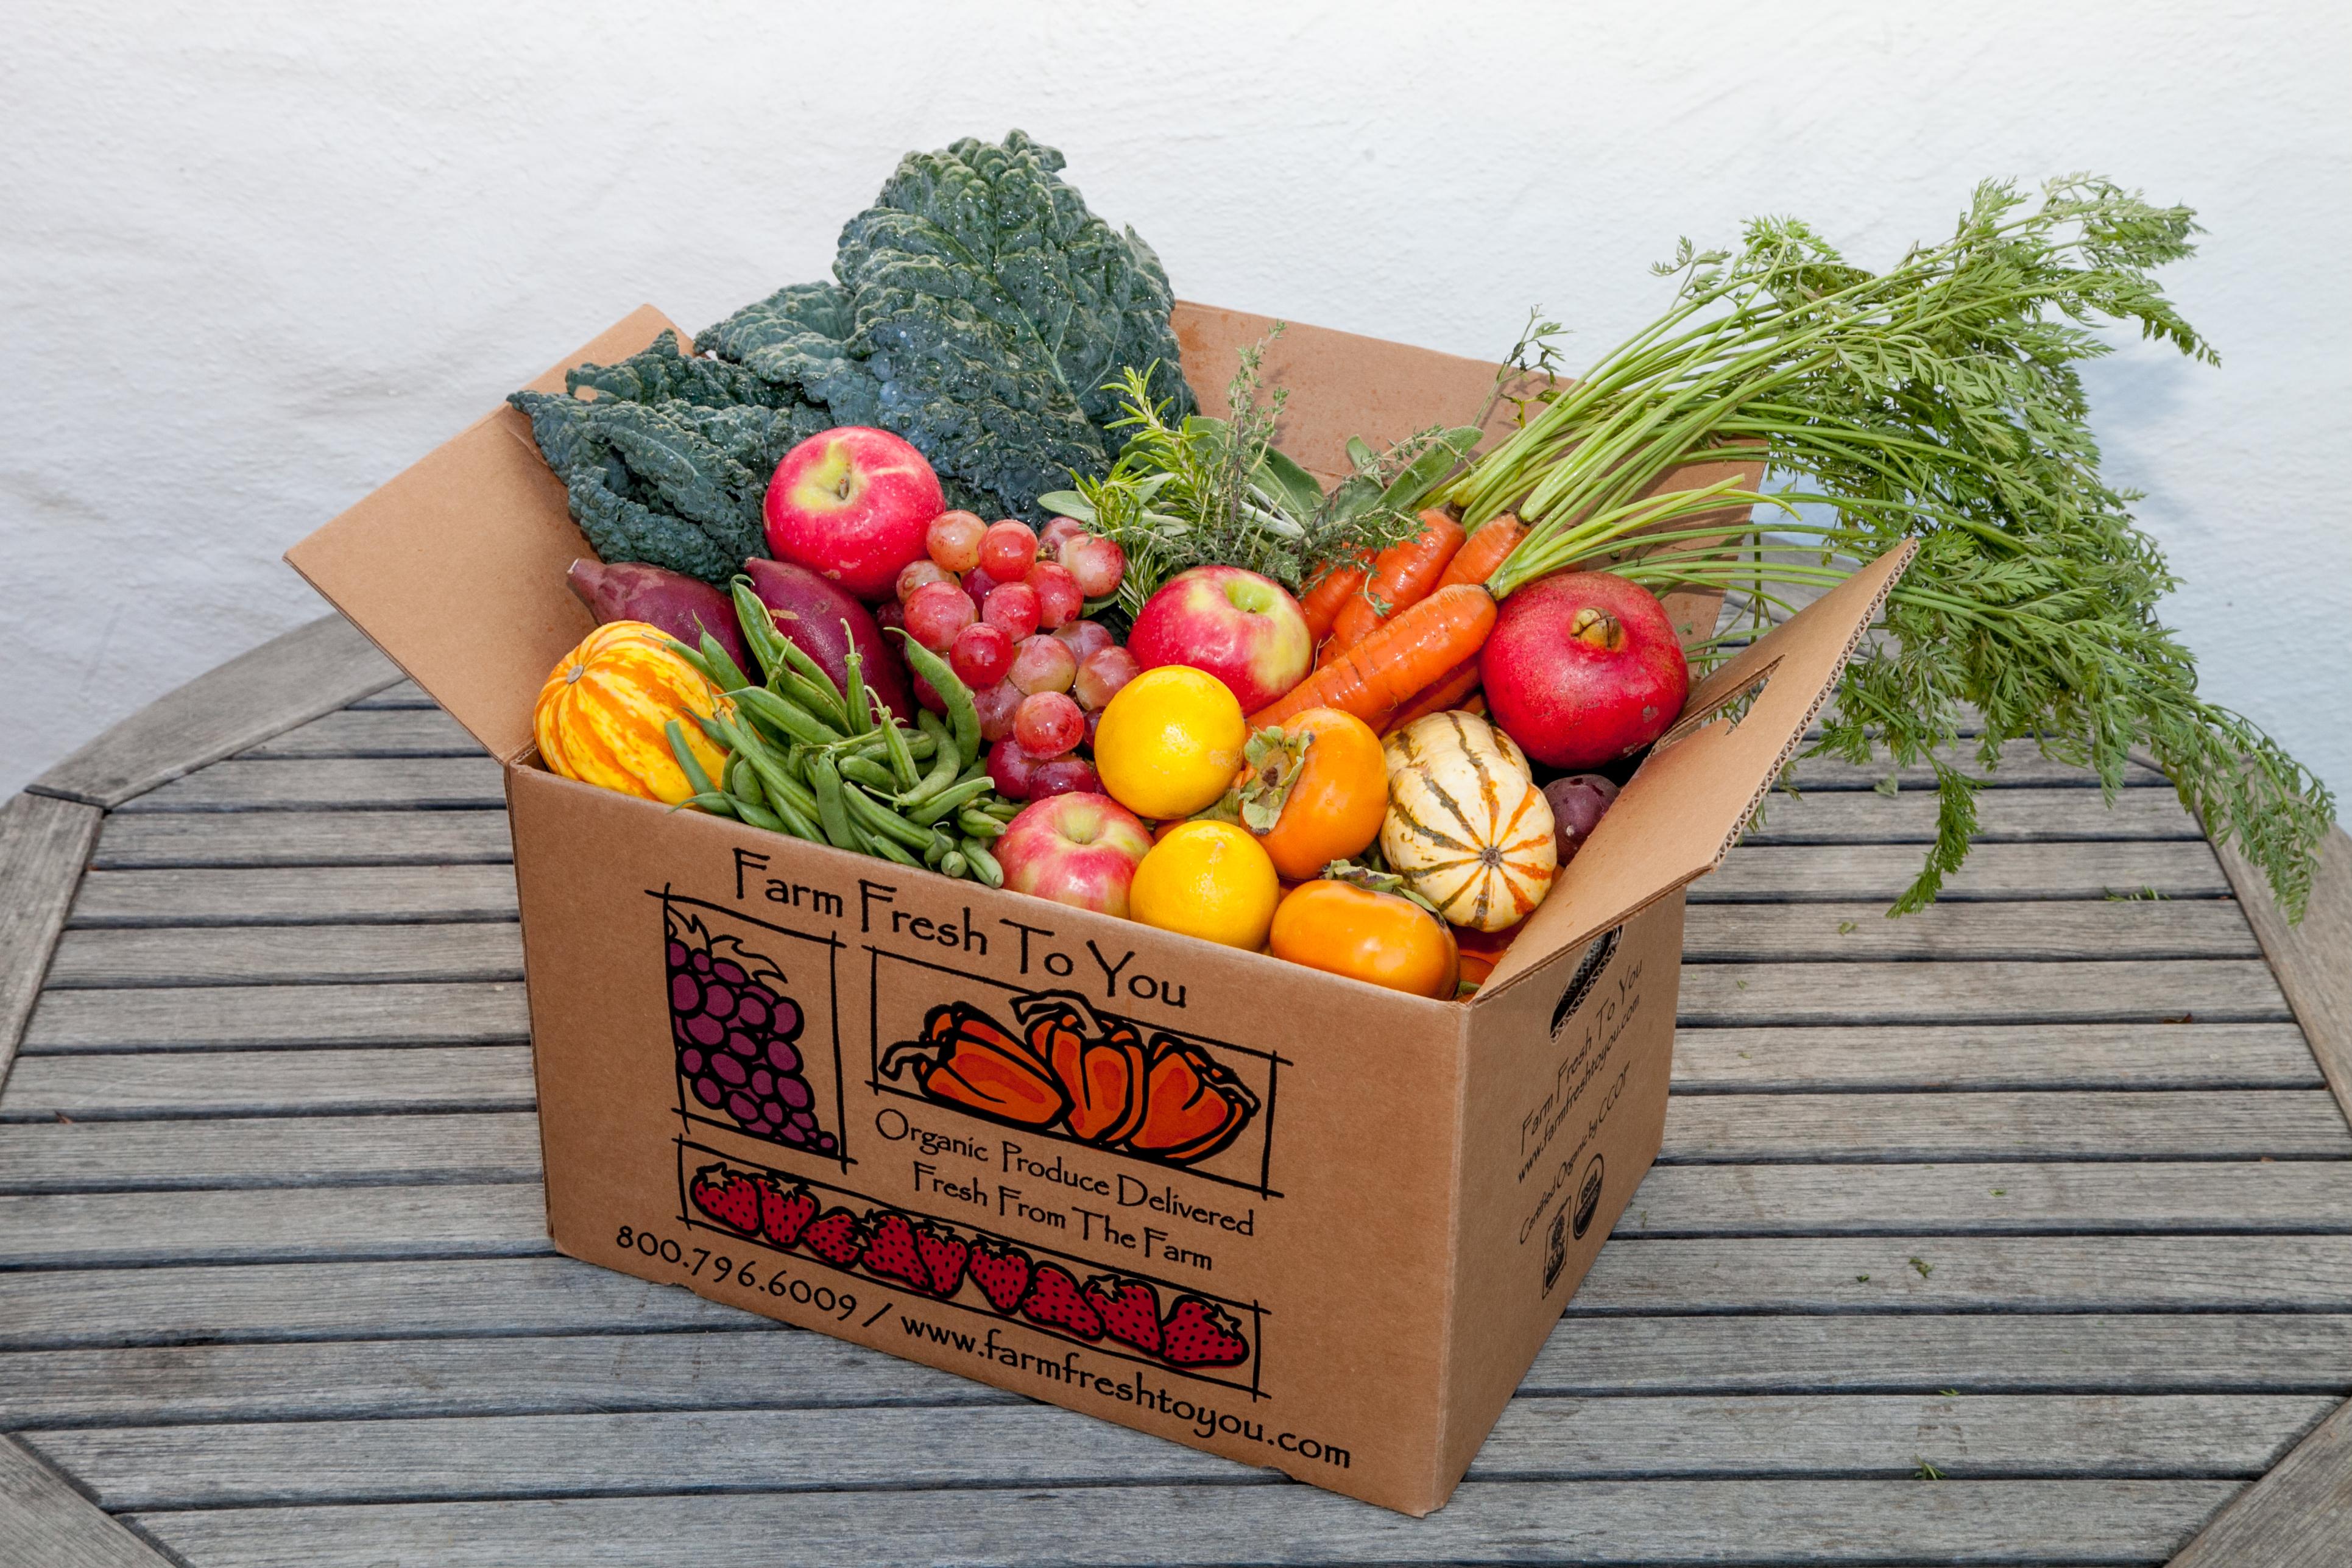 Farm_Fresh_To_You_Box_Shot.jpg